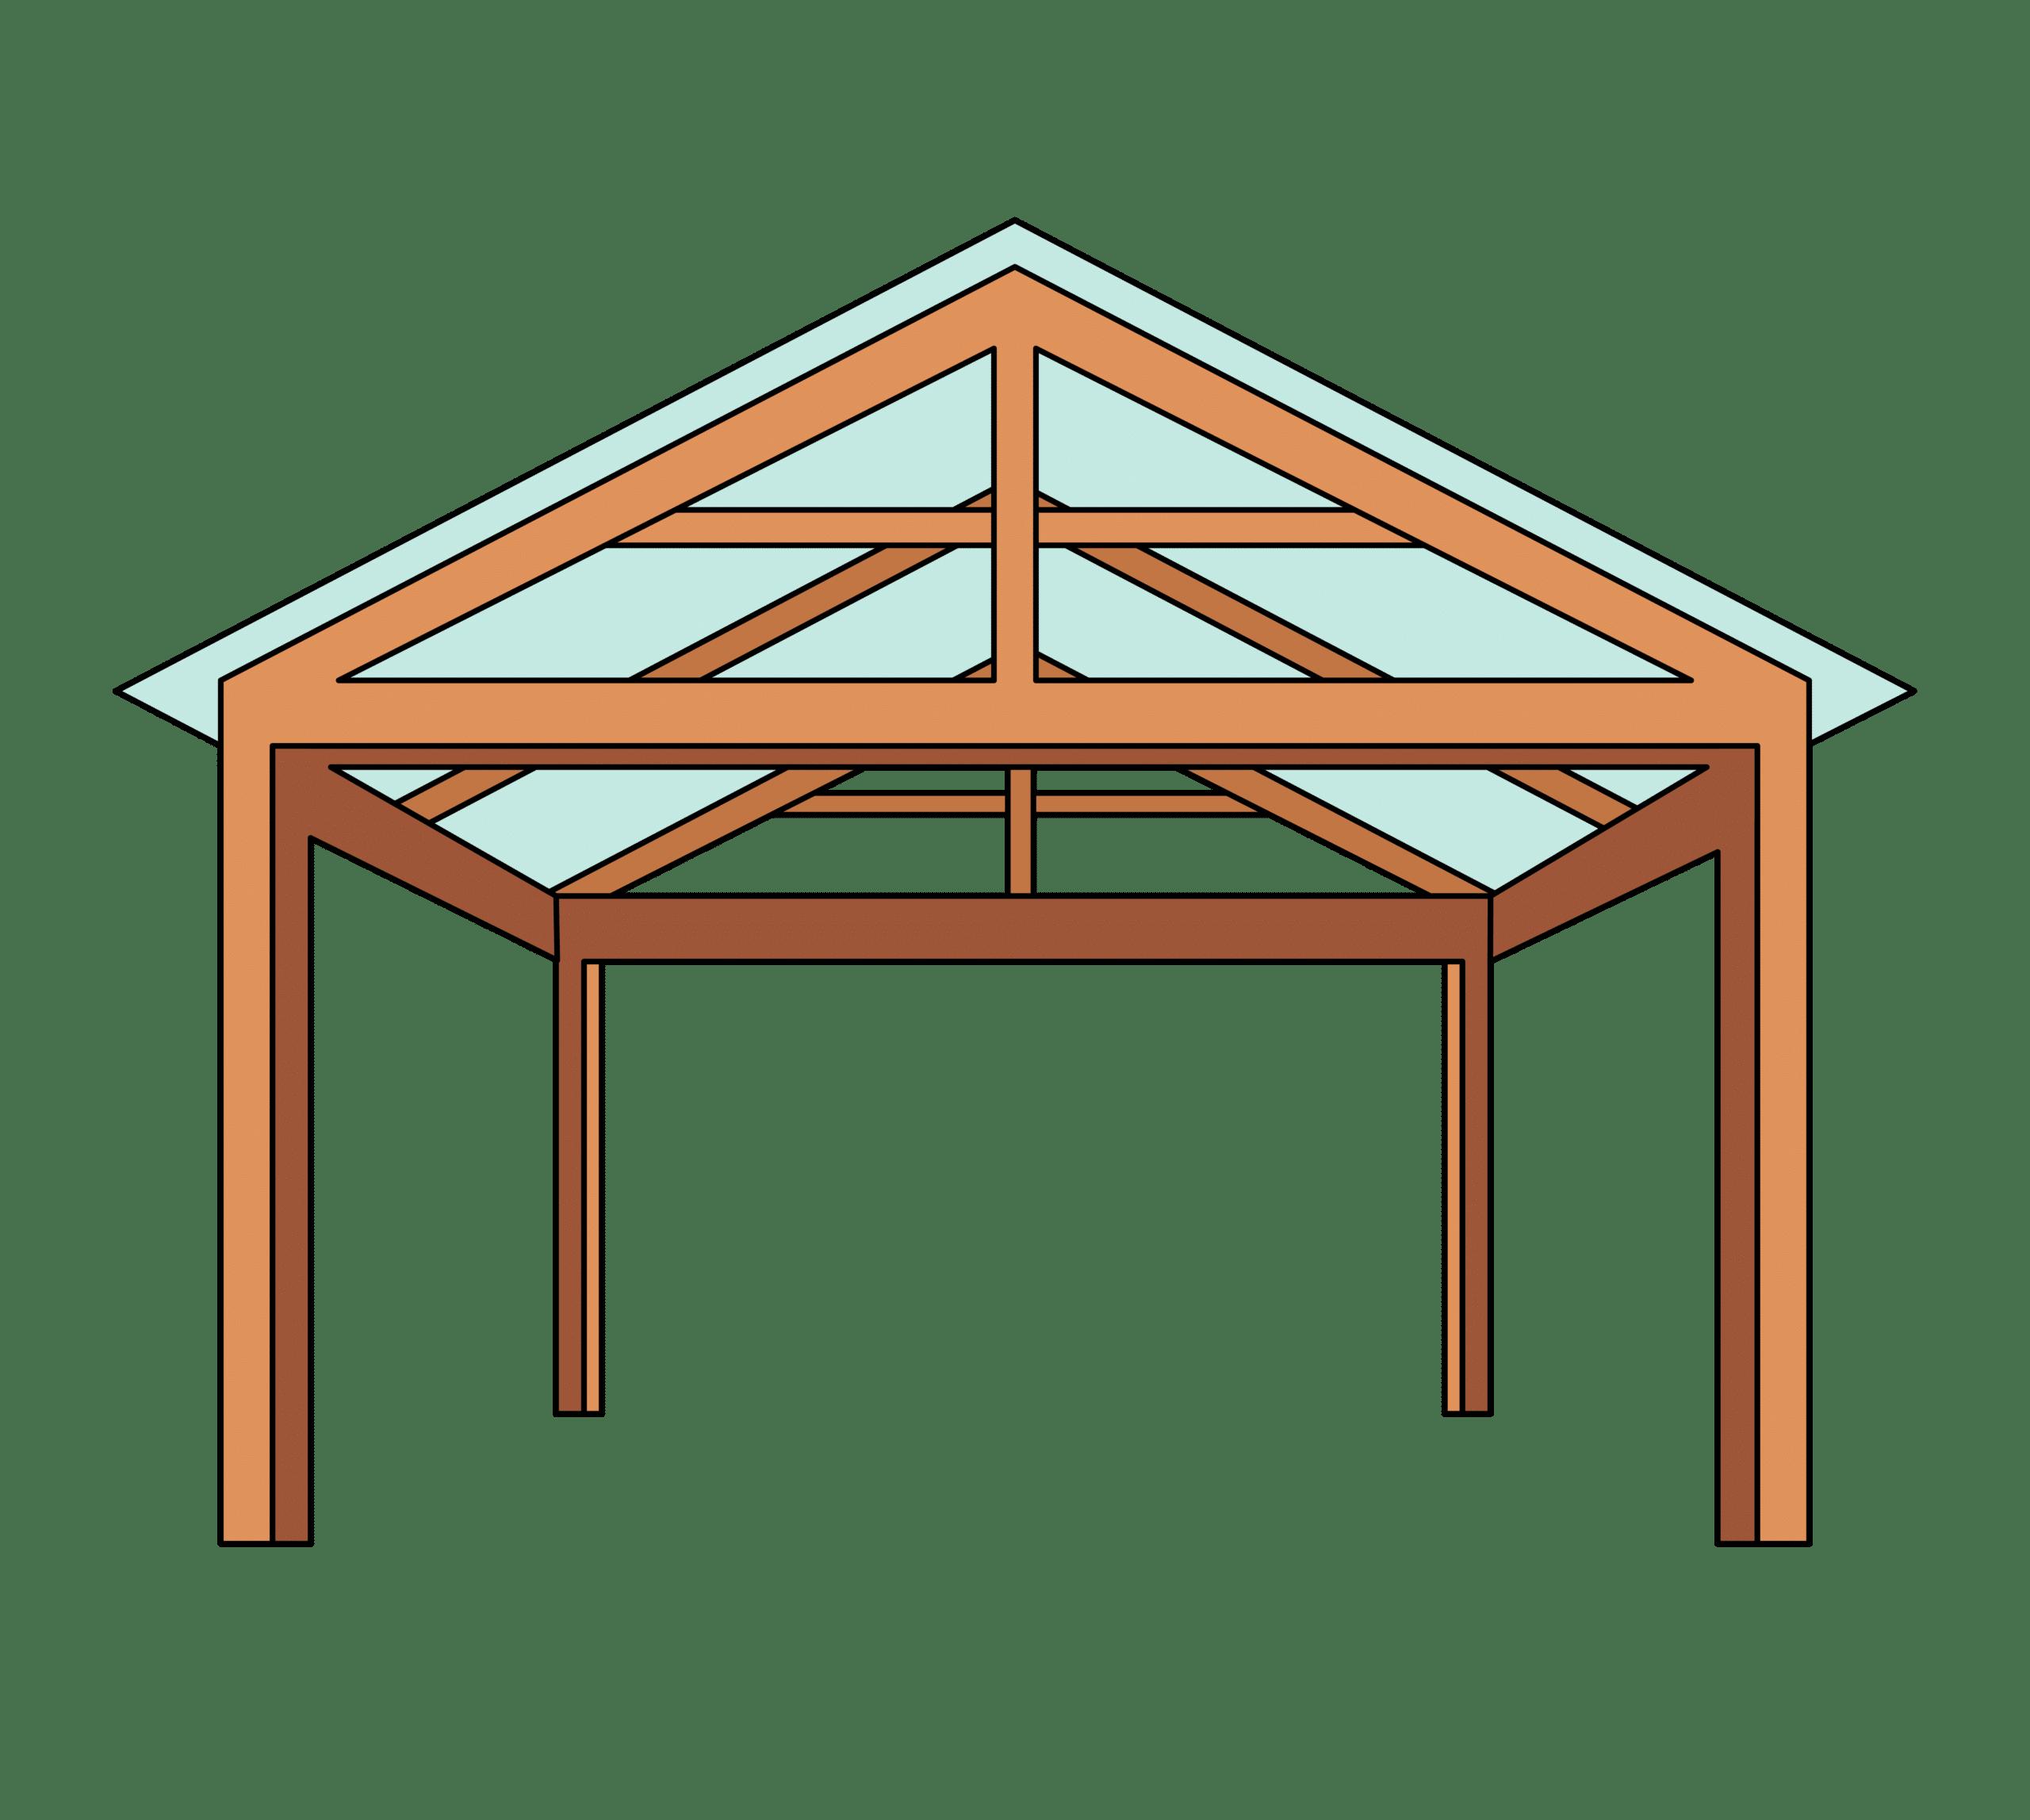 Gable roof pergola illustration